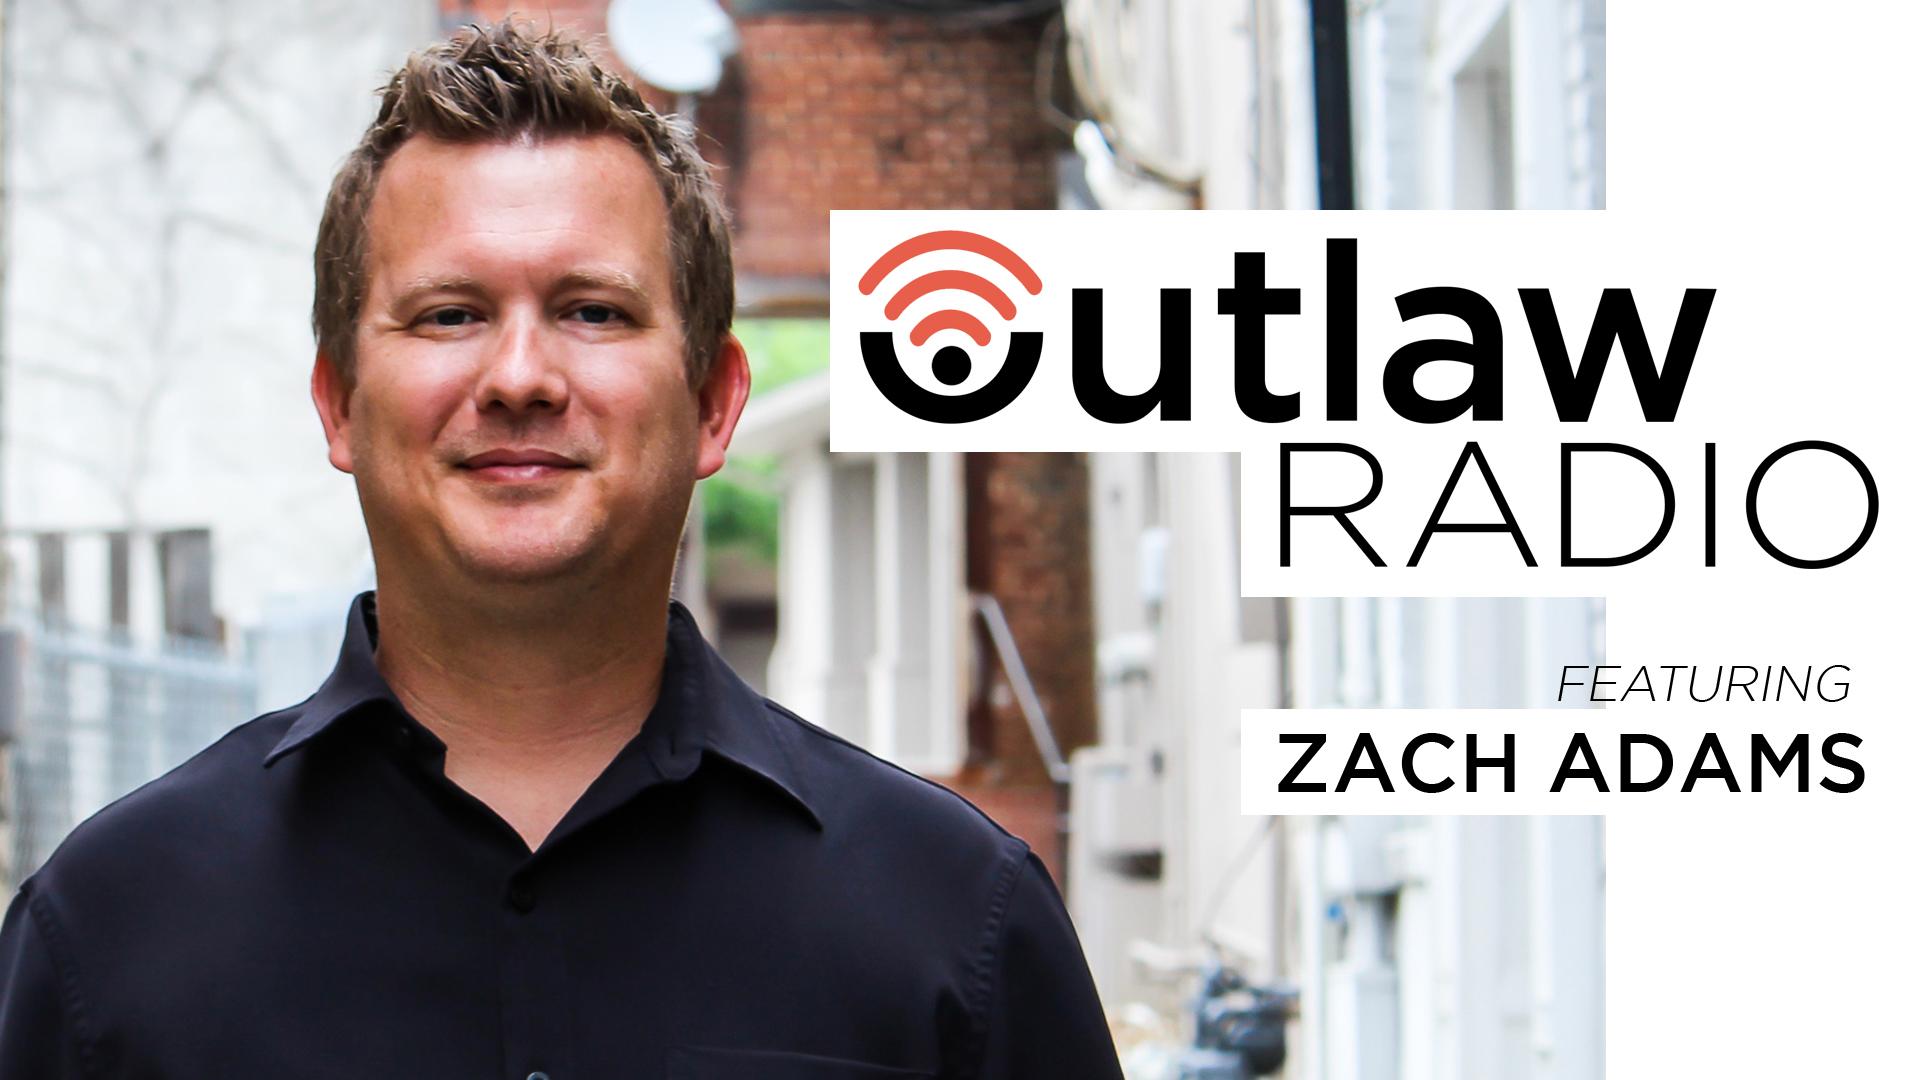 outlawradio-zach